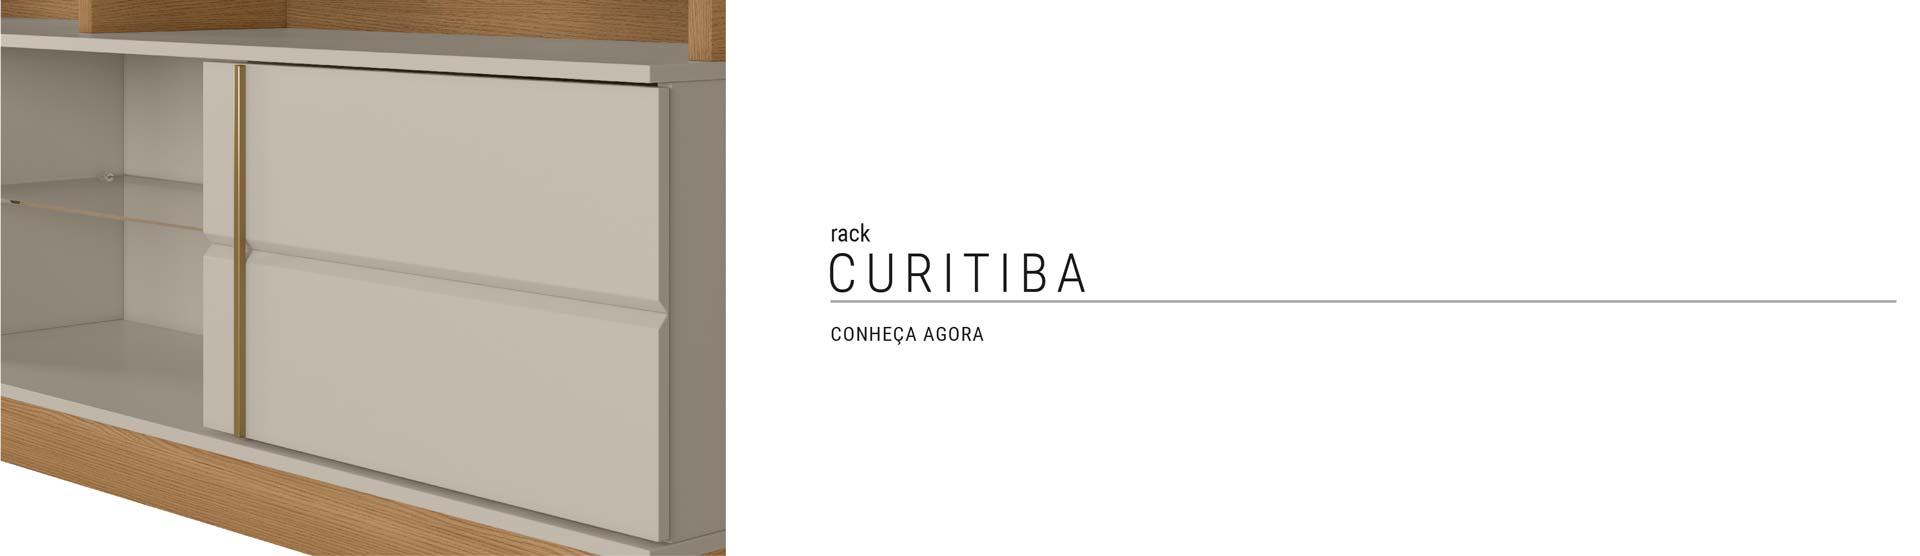 Rack Curitiba